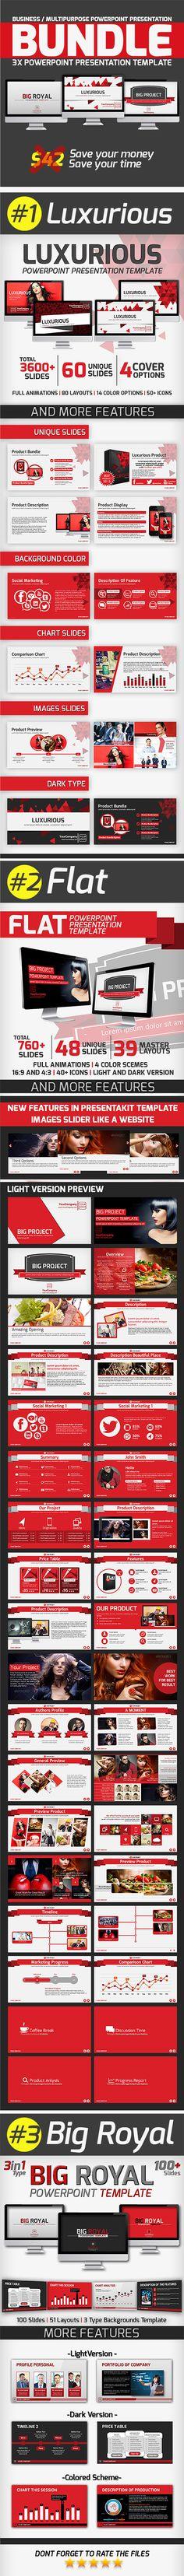 Presentakit Powerteamkit On Pinterest - Luxury food presentation template ideas